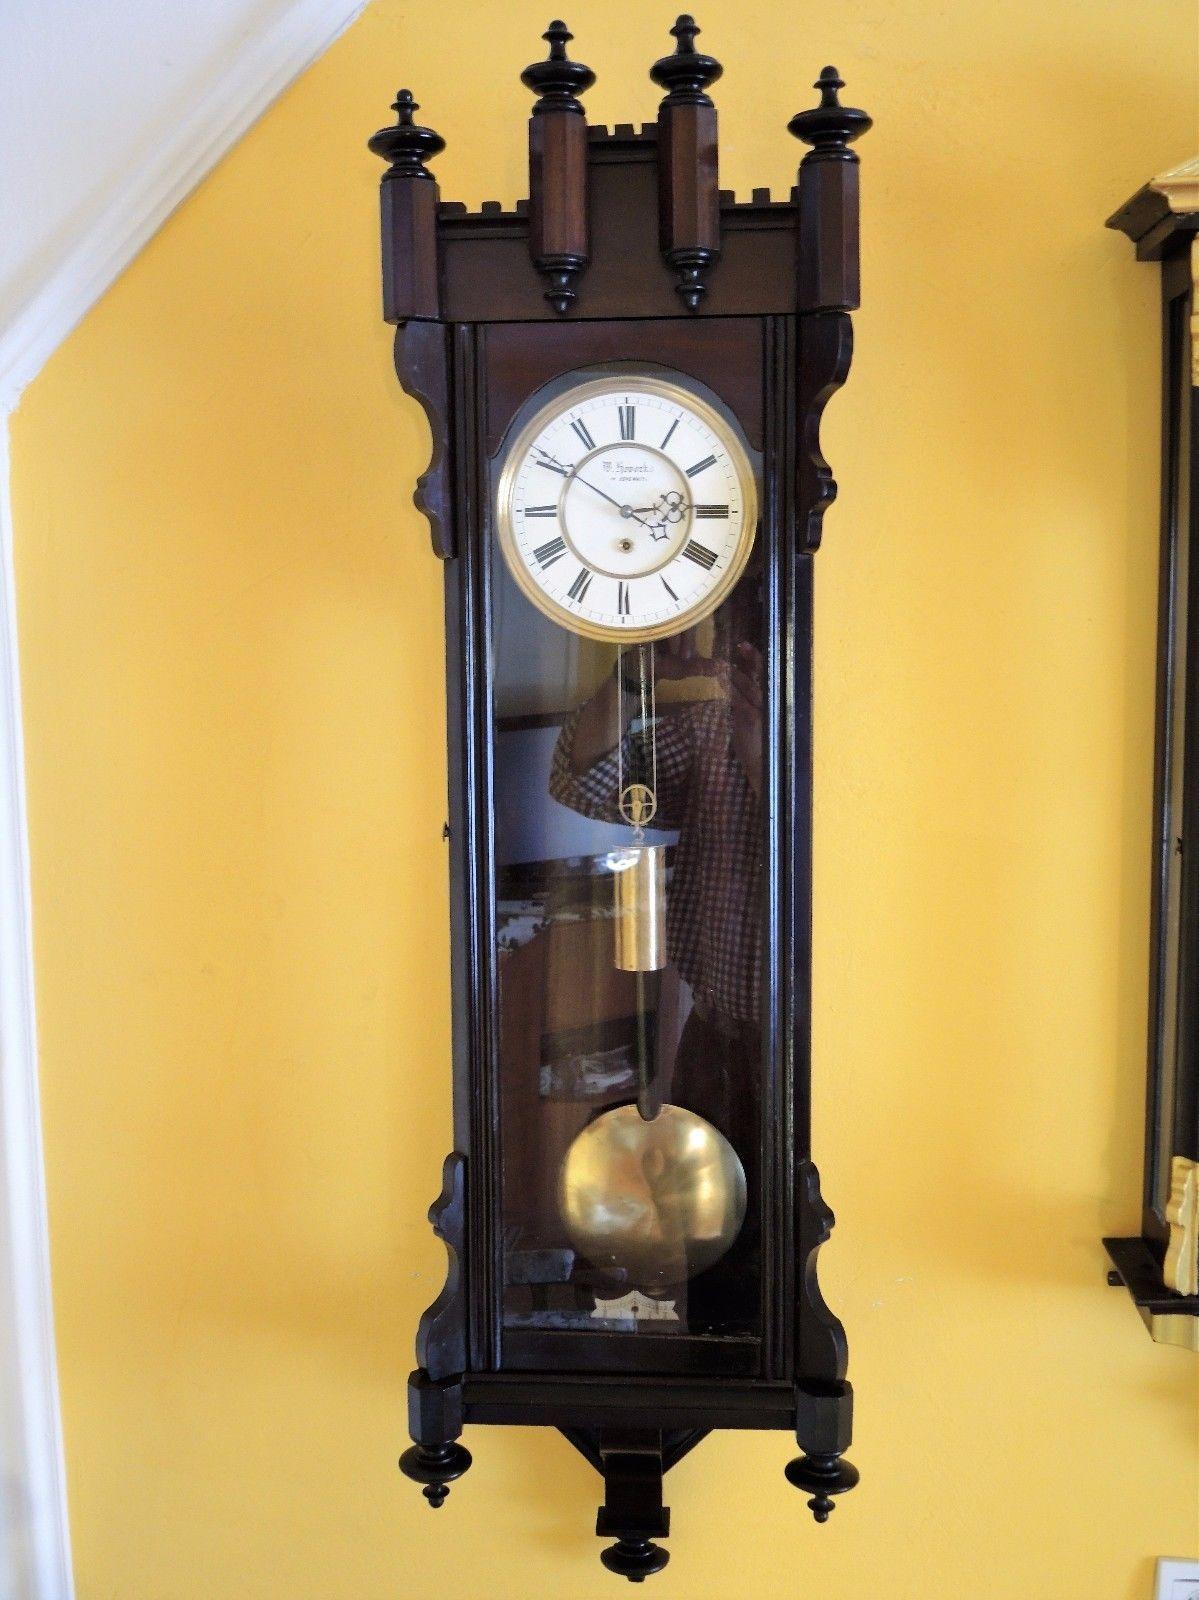 Old Antiques Antique Clocks Watches Pendulum Clock Fireplace